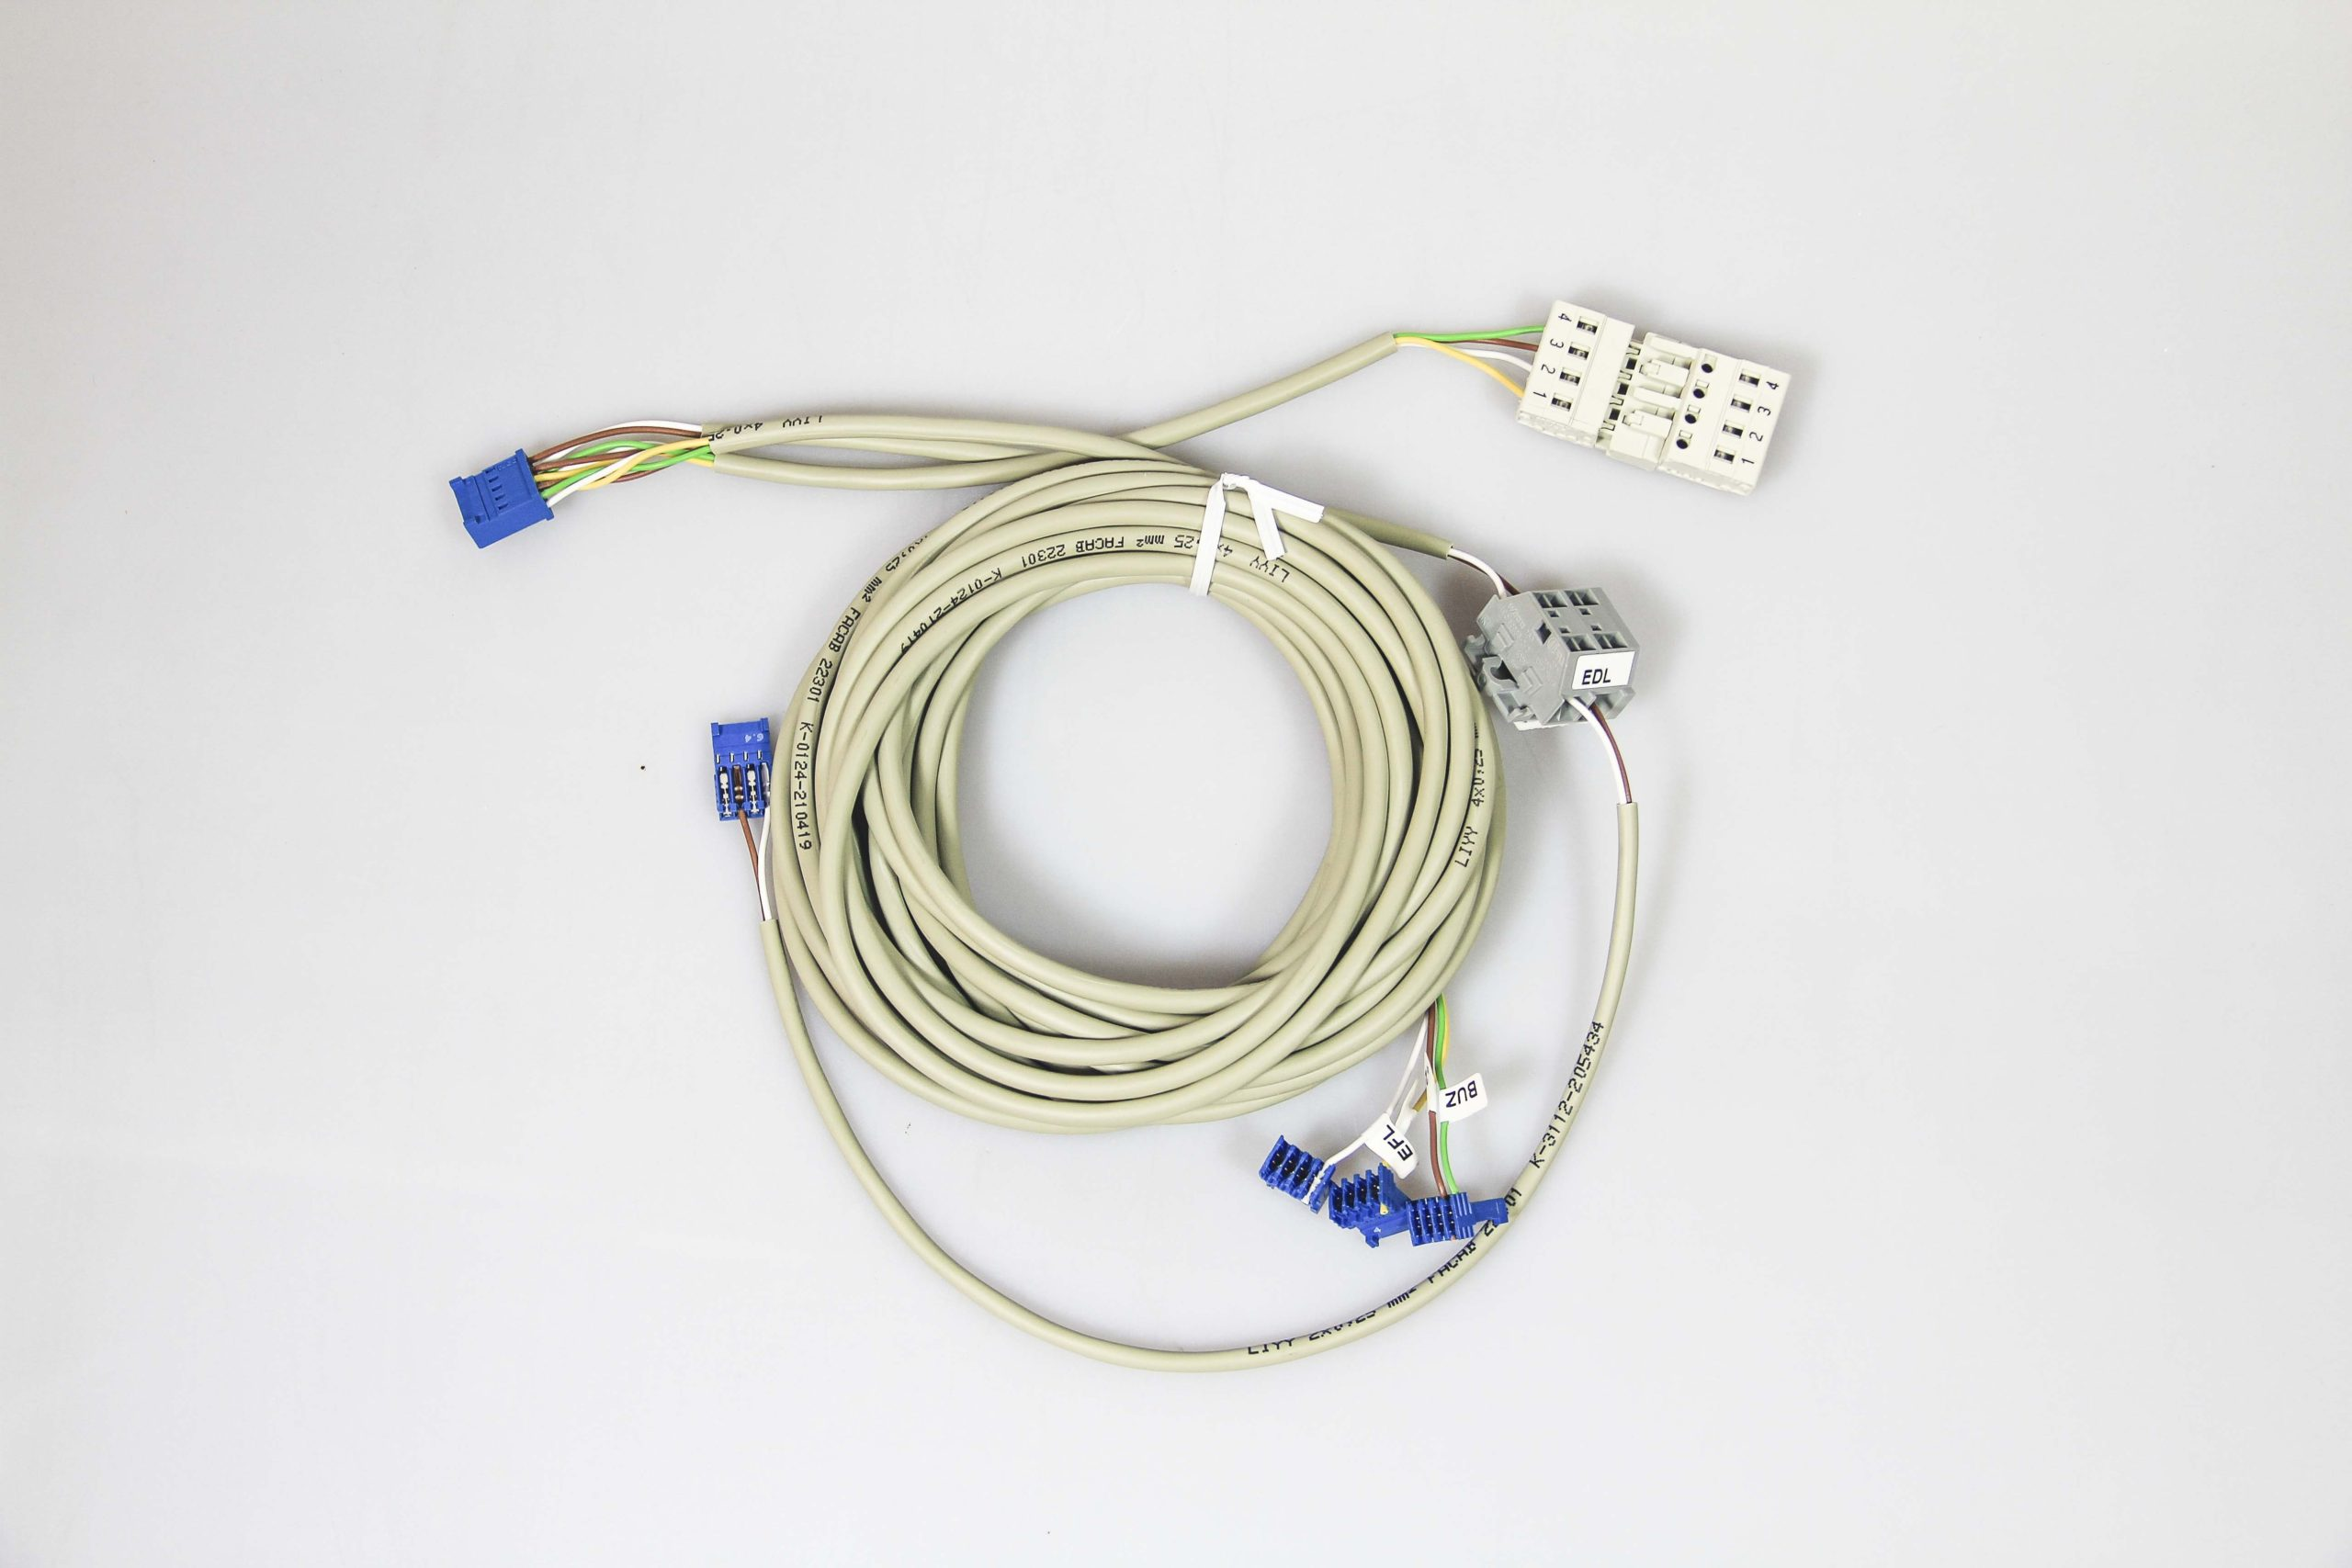 koncovka, kabelový svazek